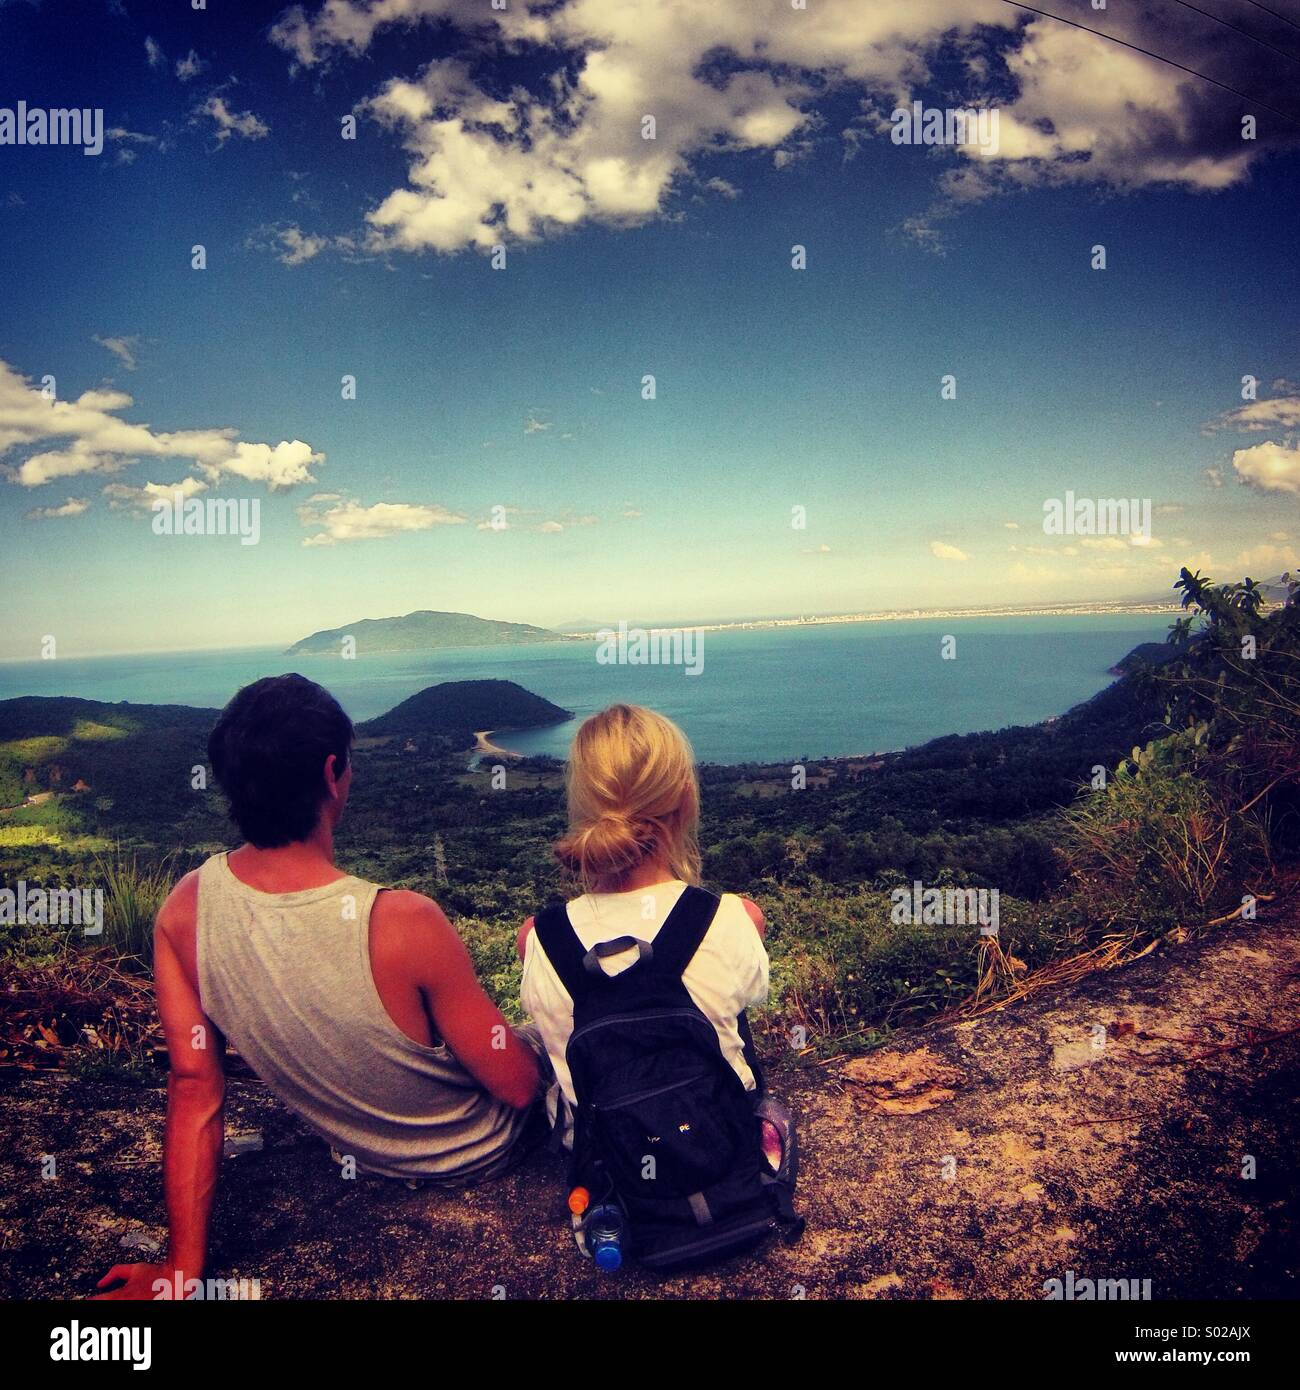 Beautiful view in Vietnam - Stock Image